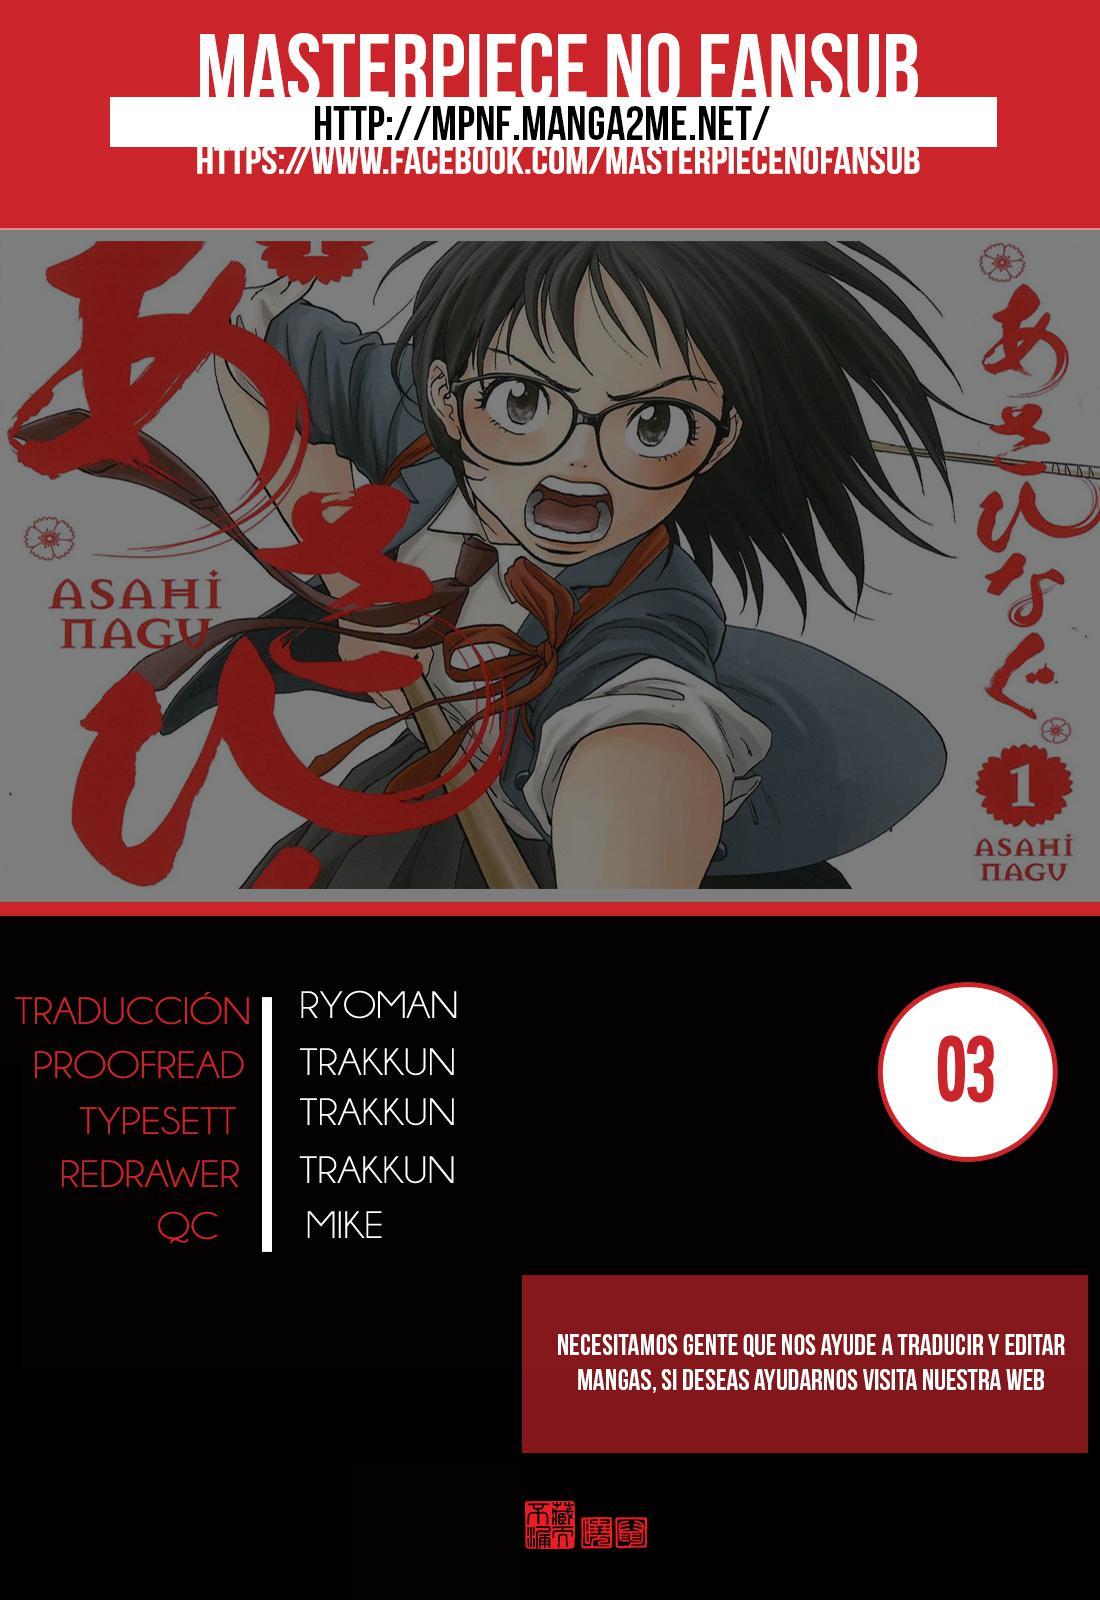 http://c5.ninemanga.com/es_manga/15/16015/392704/91f2206beaf10569fdc3b12aaa4c81ba.jpg Page 1